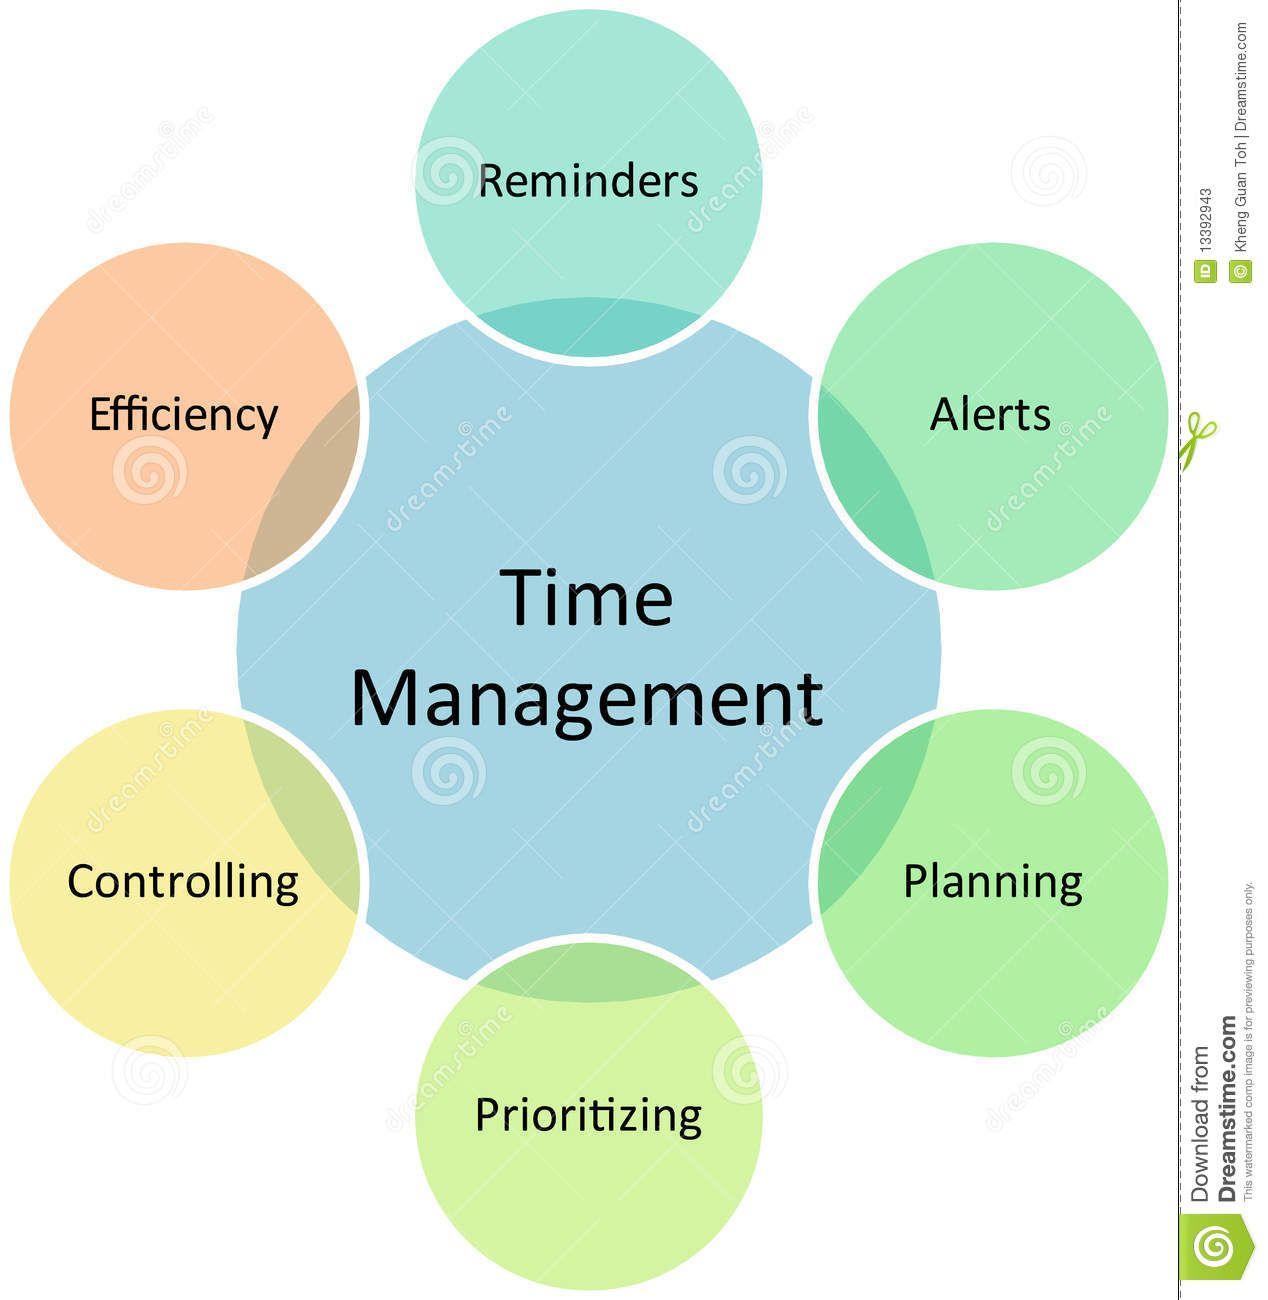 Time Management Skills Diagram Wire Data Schema Of Lm7805 Powersupplycircuit Circuit Seekiccom Google Search Interesting Pinterest Rh Com Basic Chart Daily Template